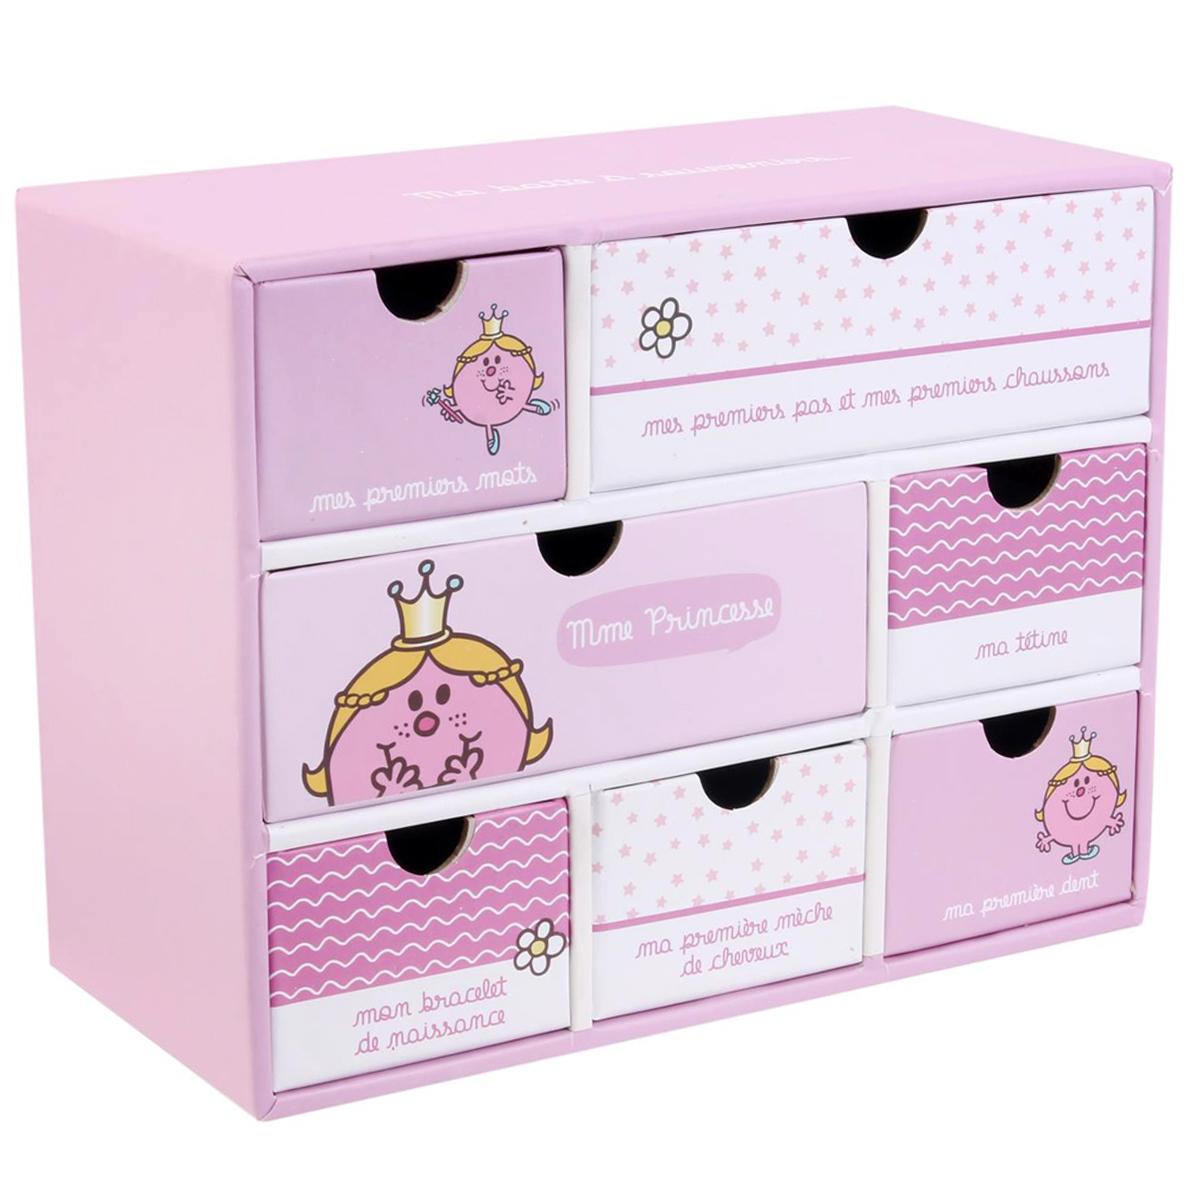 Boite à souvenirs \'Monsieur Madame\' rose (Madame Princesse) - 196x15x9 cm - [Q9317]